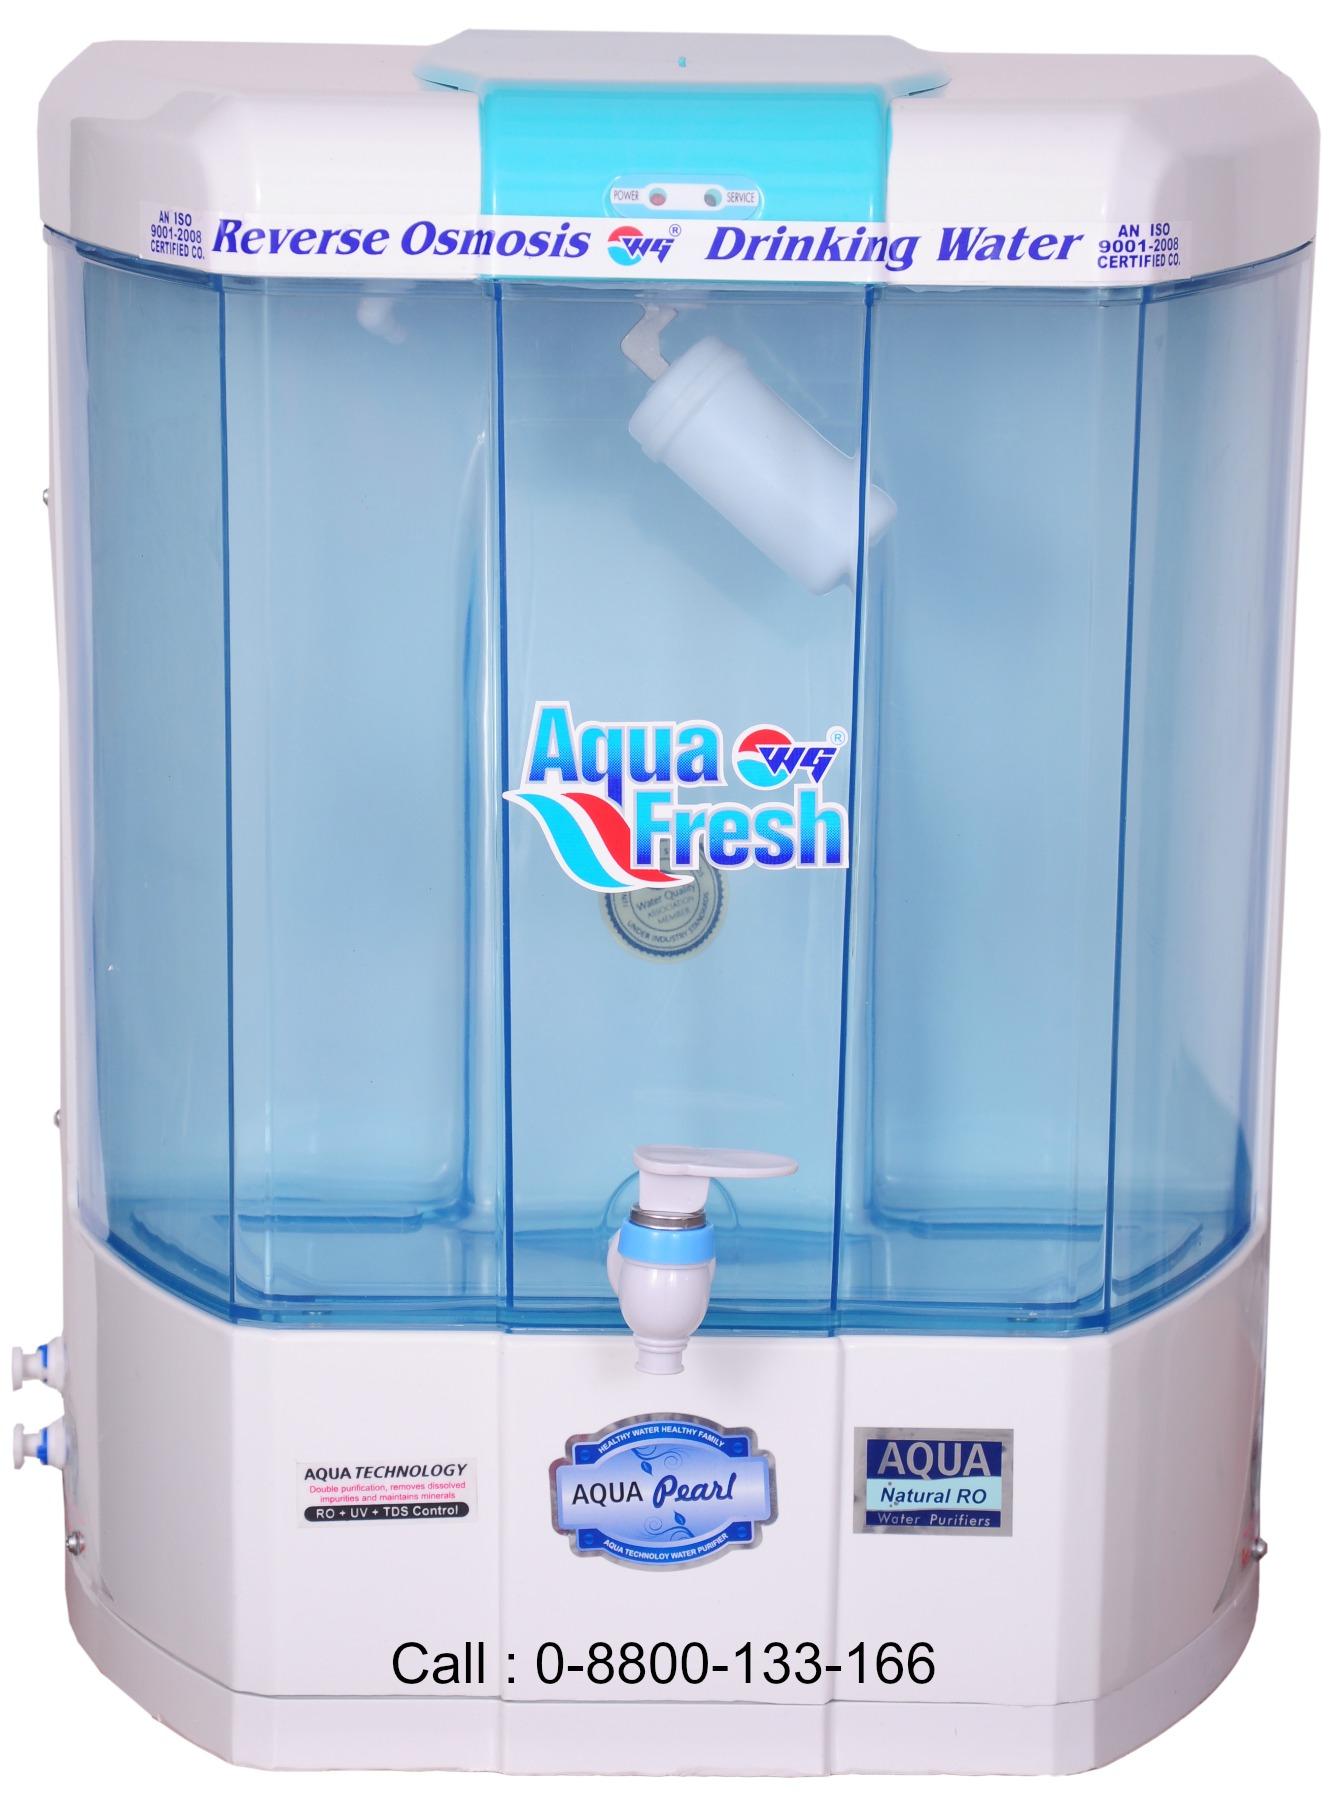 Clich here: Aqua Pearl